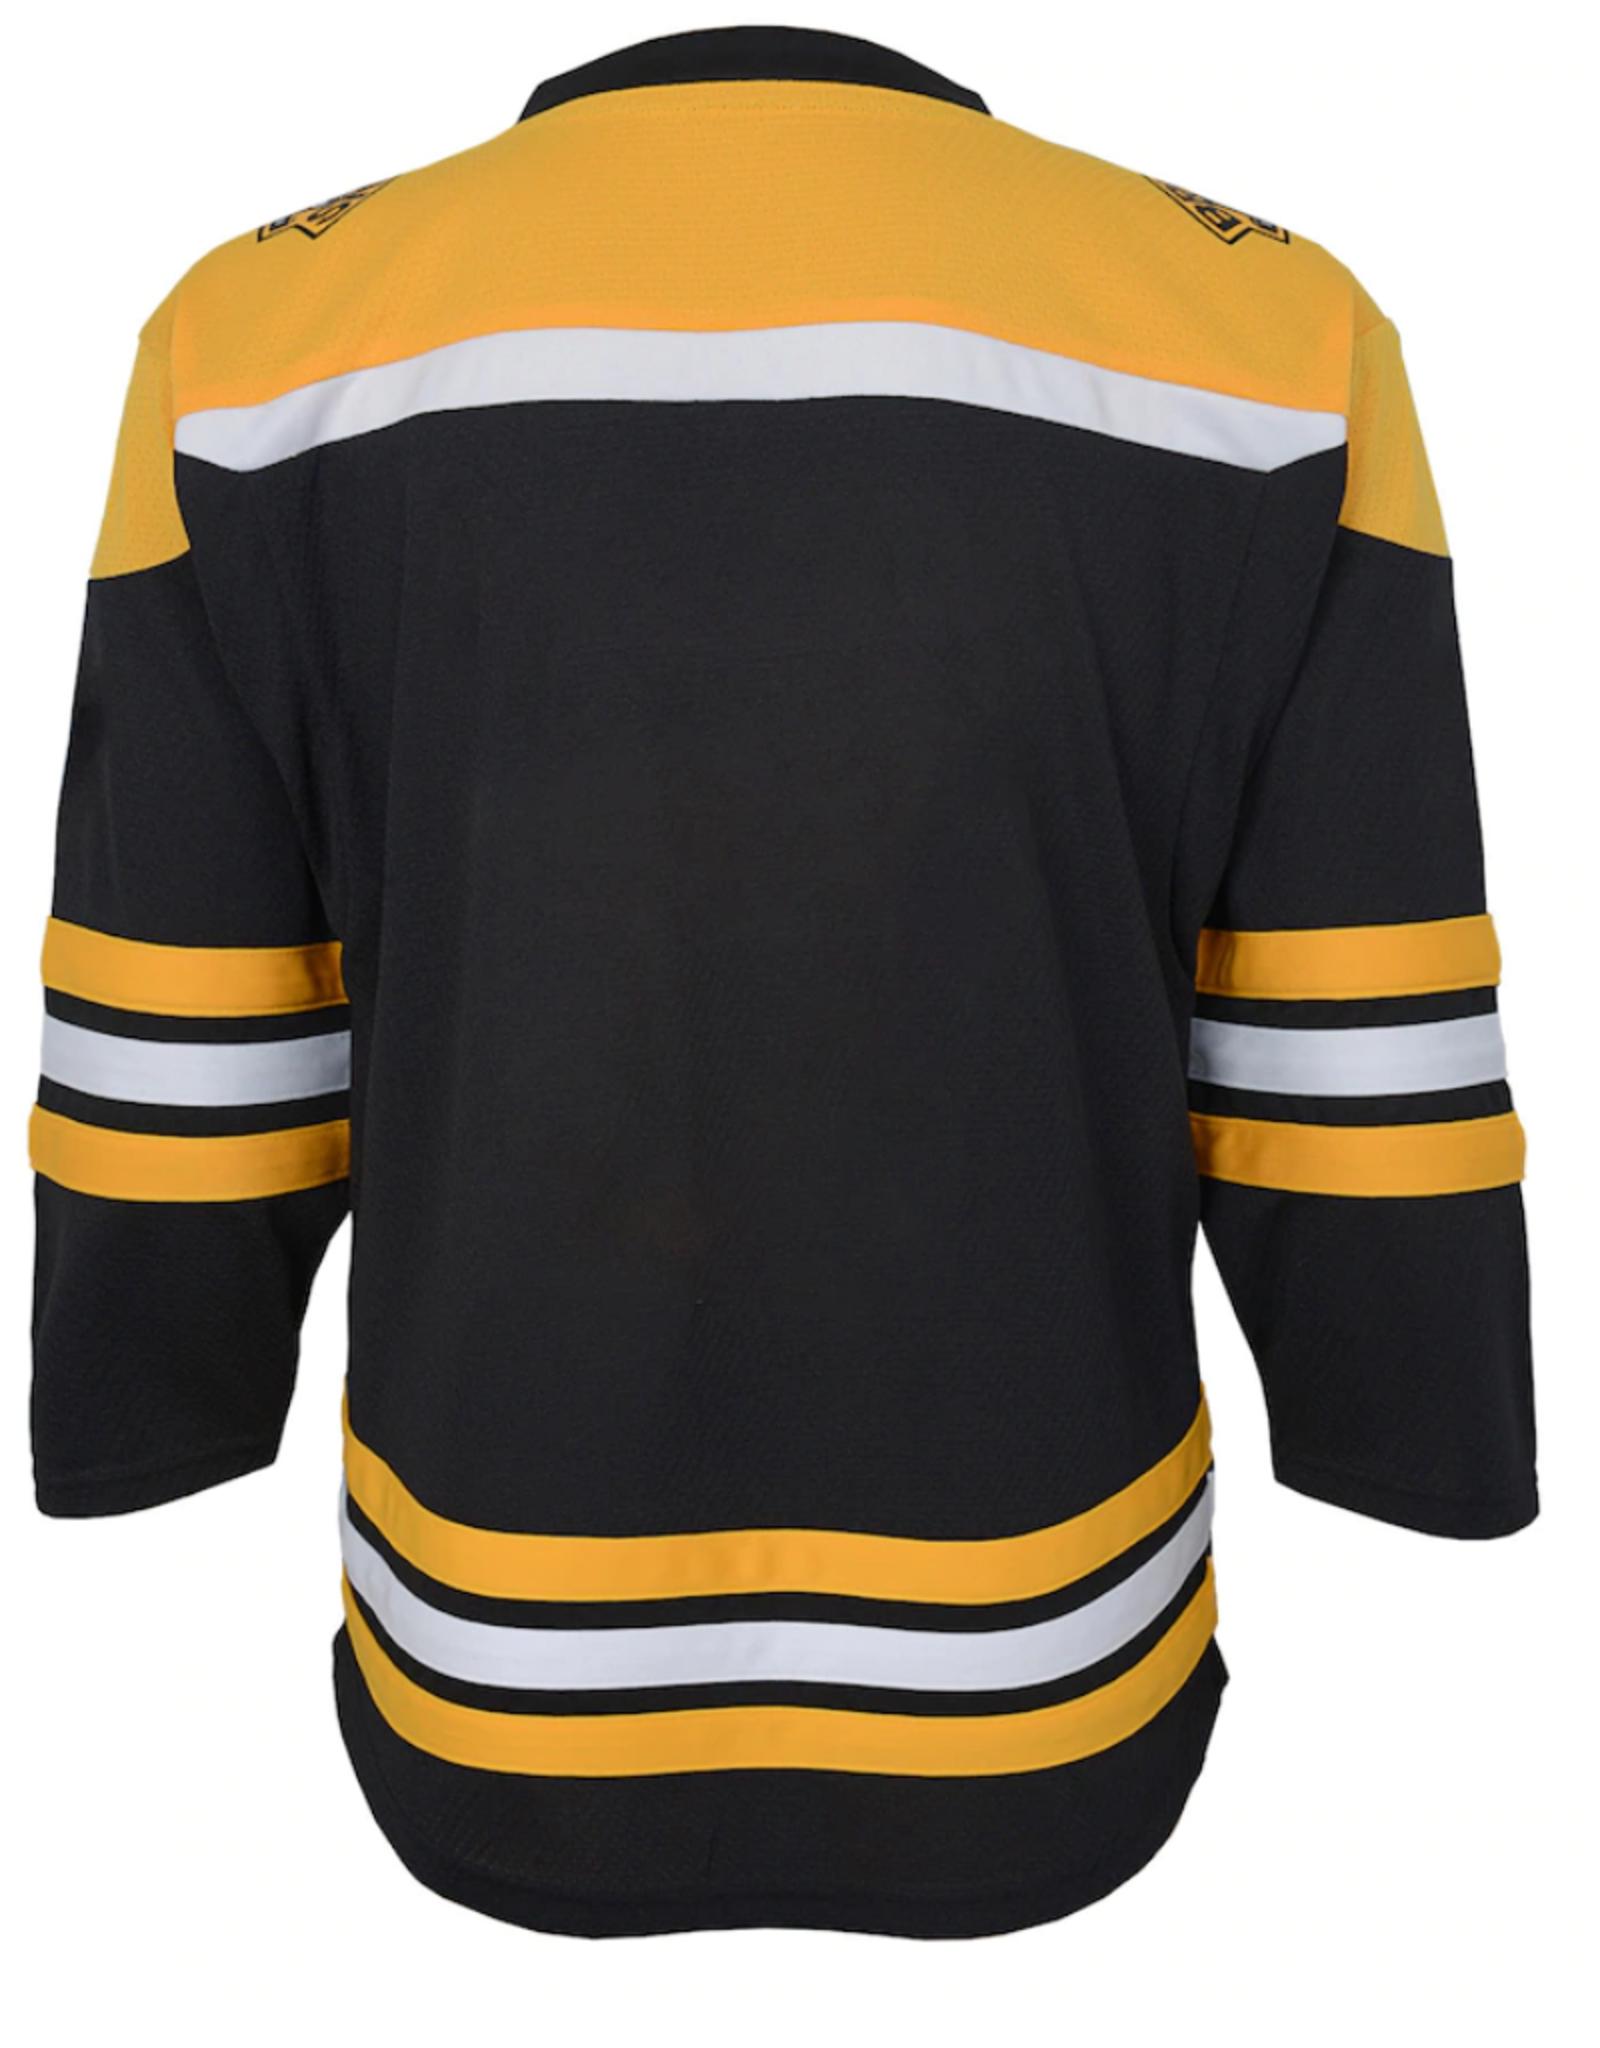 NHL Toddler Replica Jersey Boston Bruins 2-4T